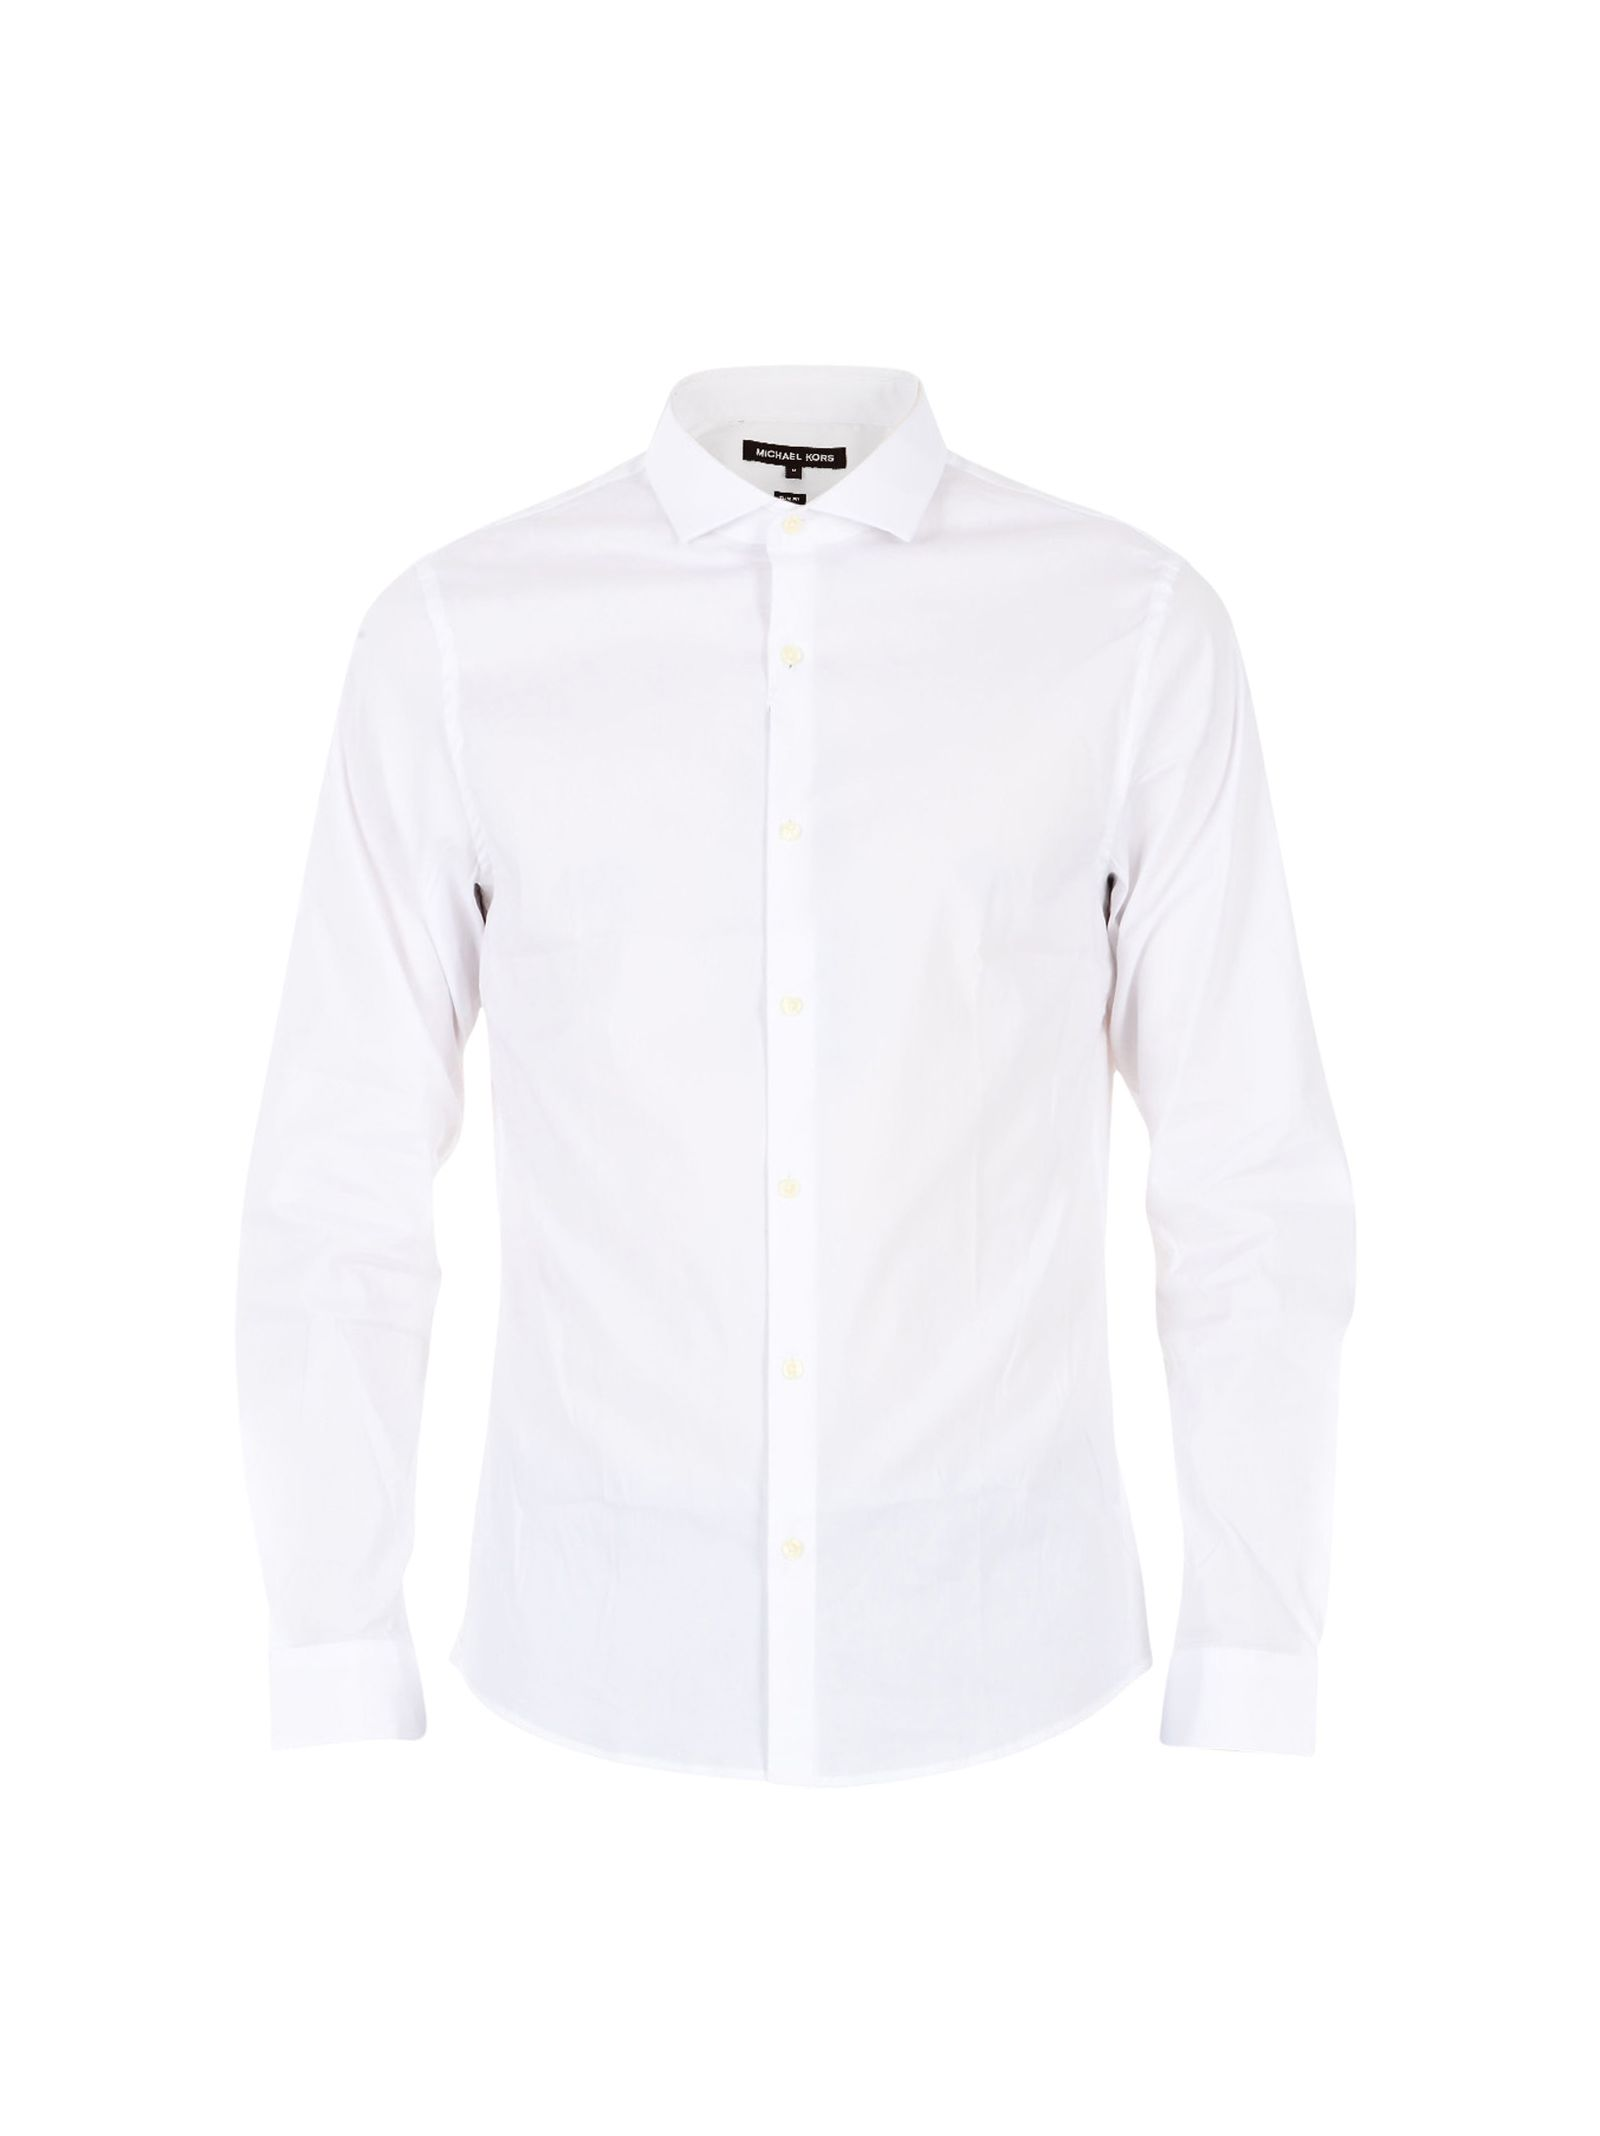 michael kors male white classic shirt